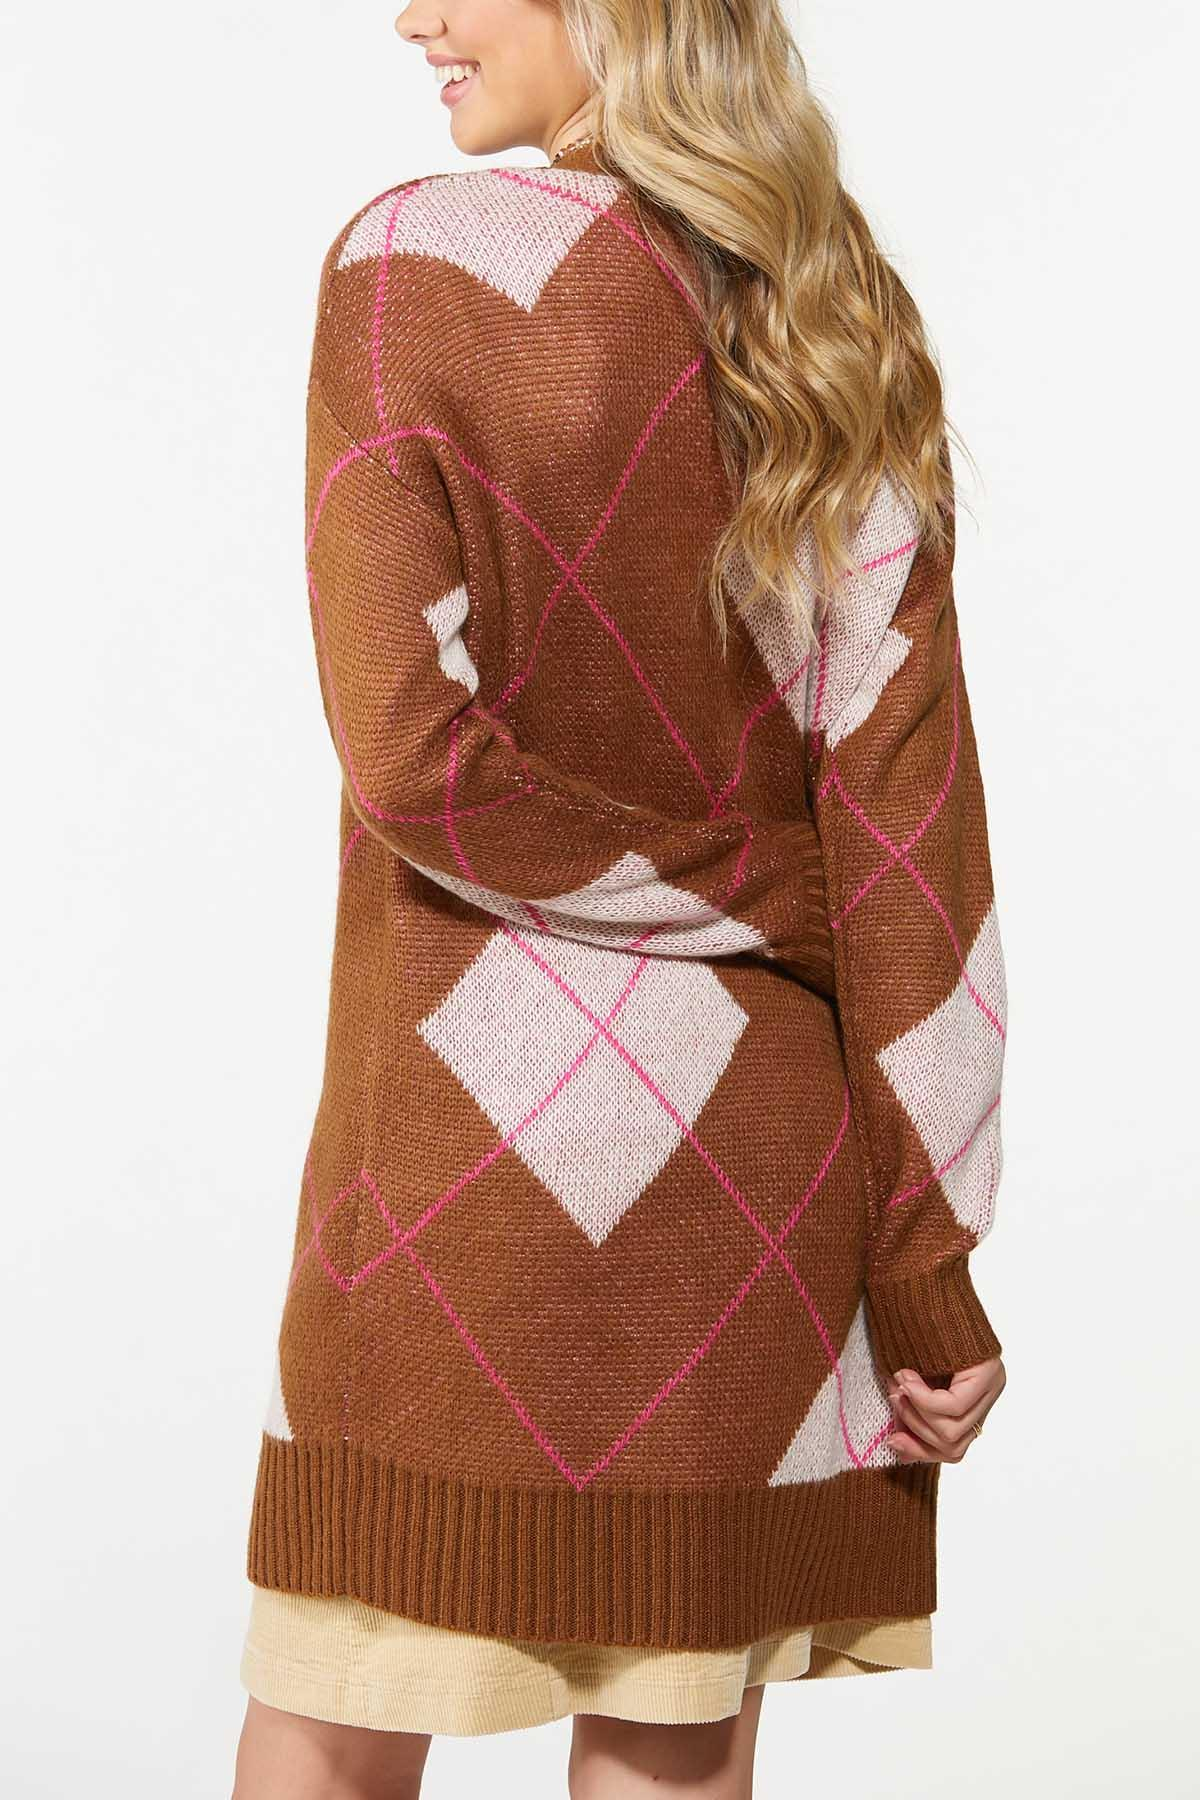 Hint Of Pink Argyle Cardigan (Item #44700303)